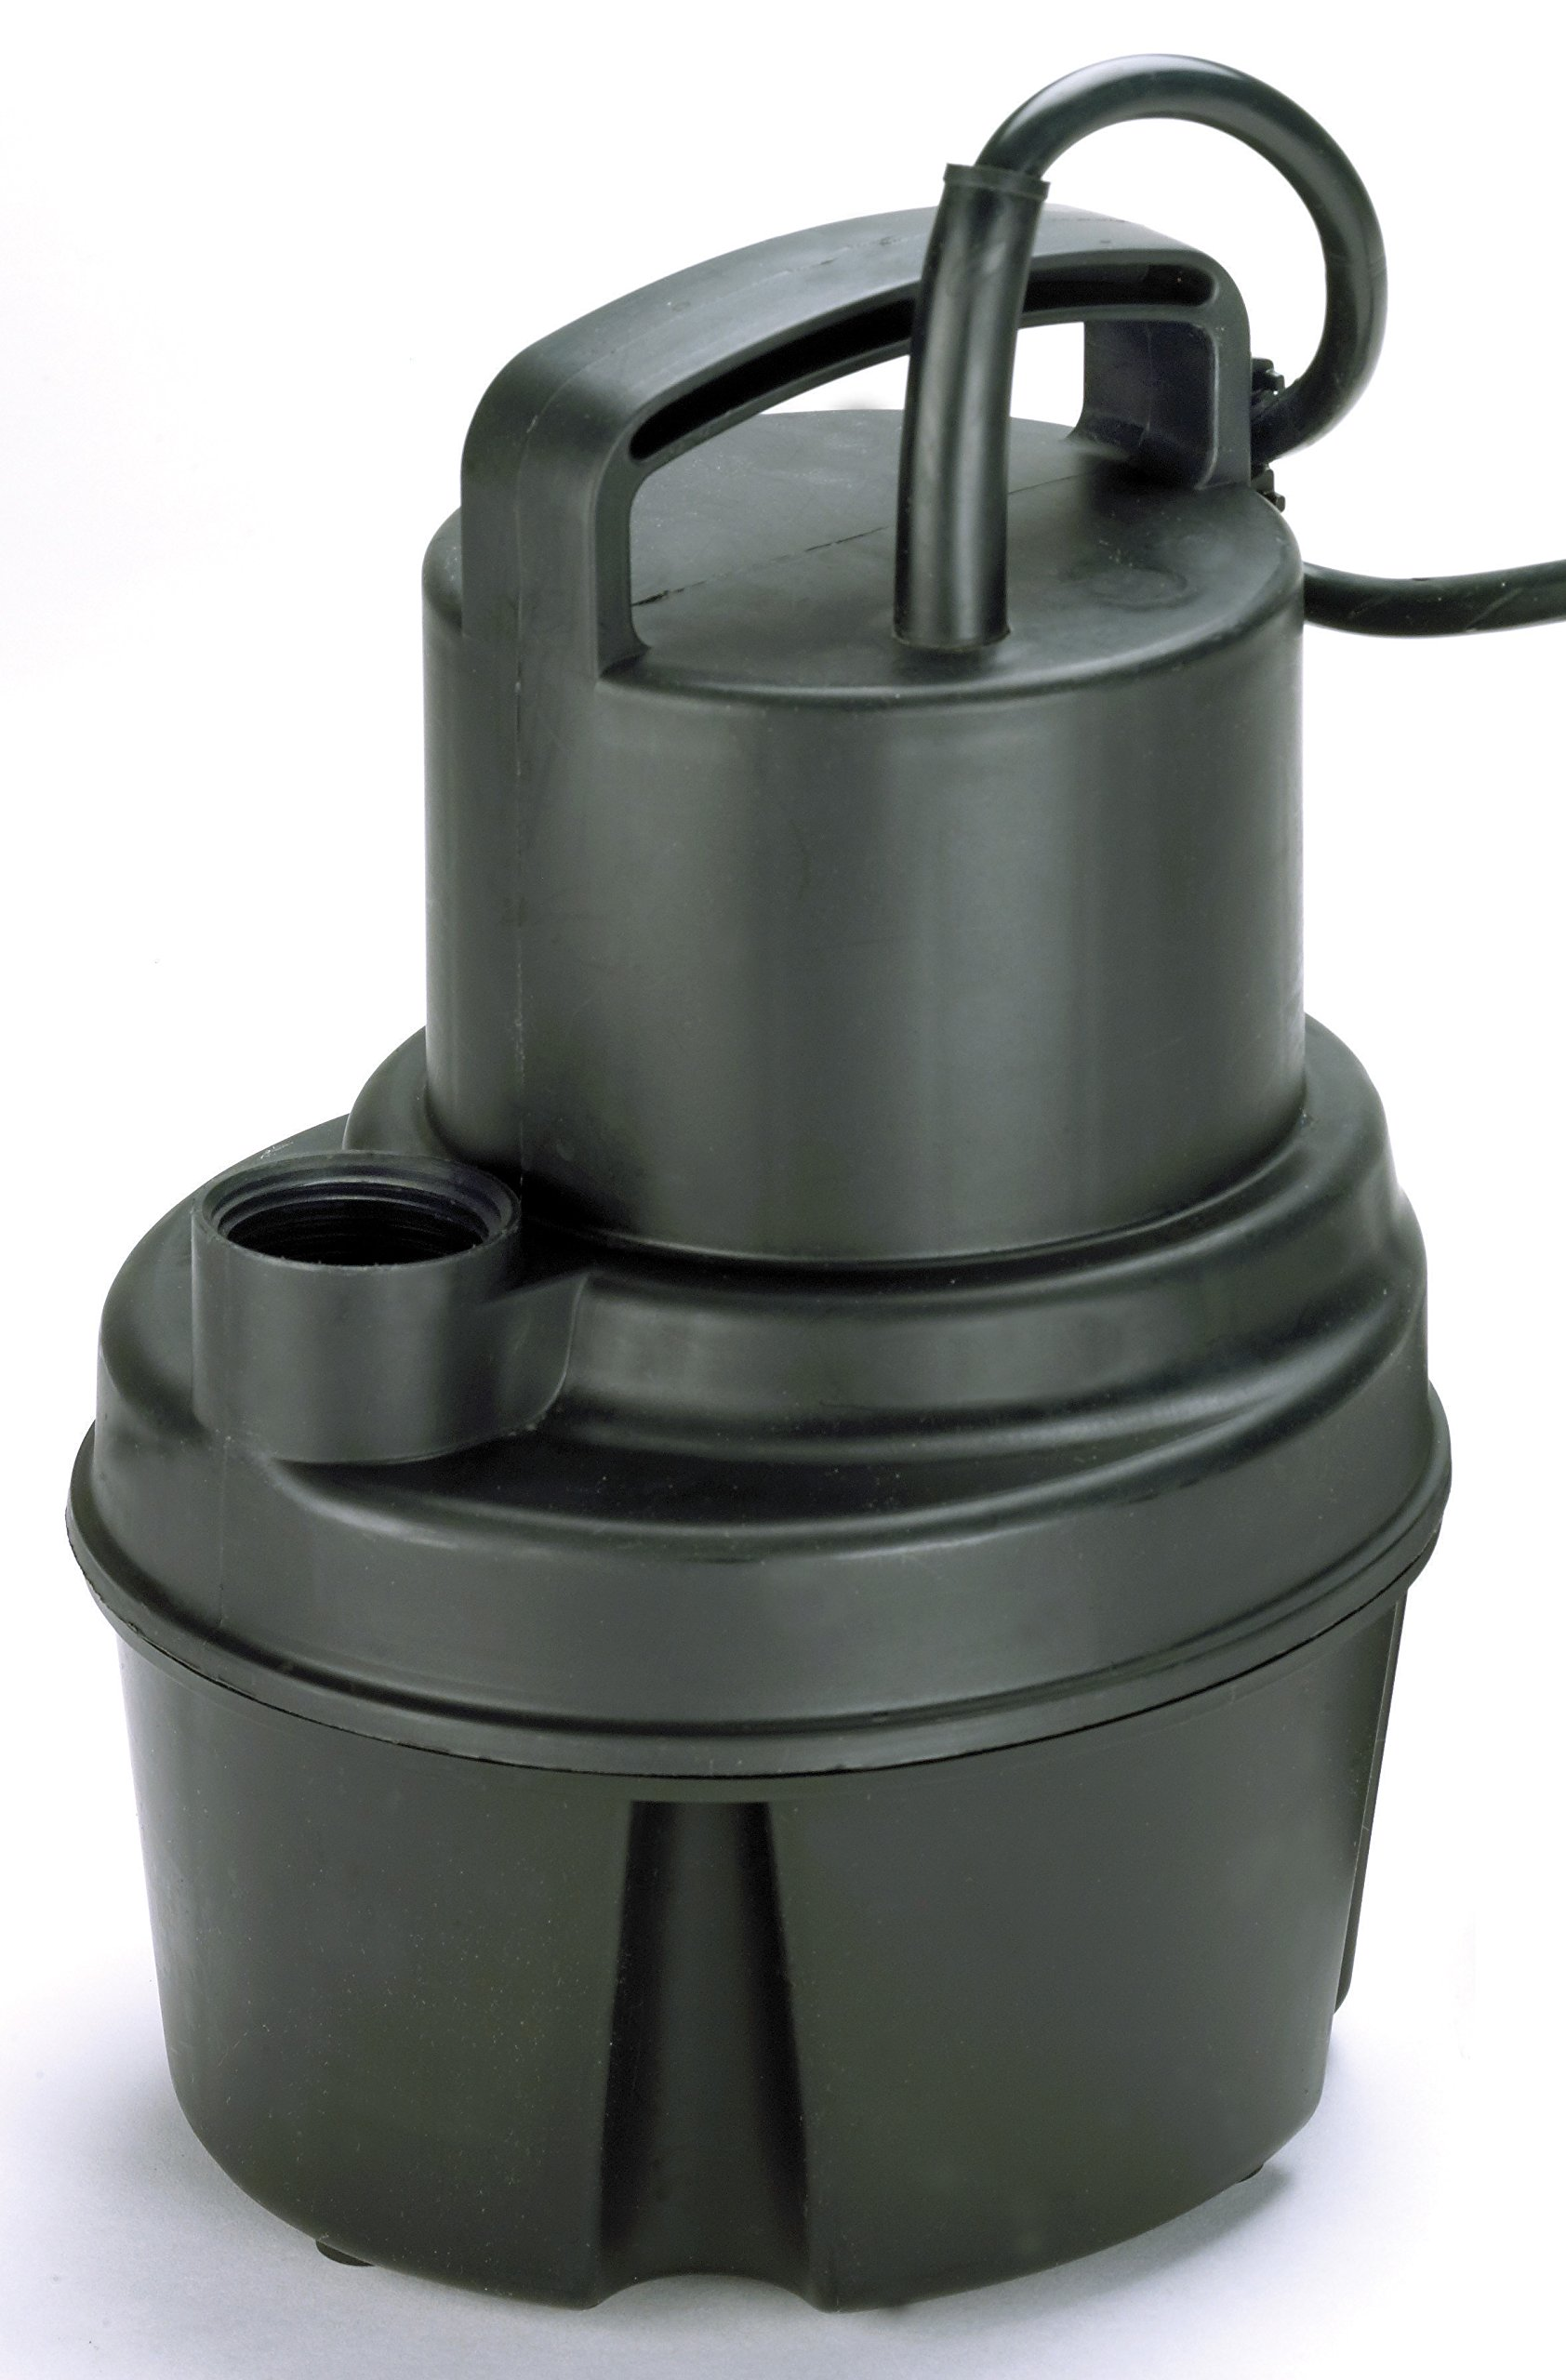 Danner Manufacturing, Inc. Mainstream 6MSP, 1400GPH Utility Sump Pump, #02585 by DANNER MANUFACTURING